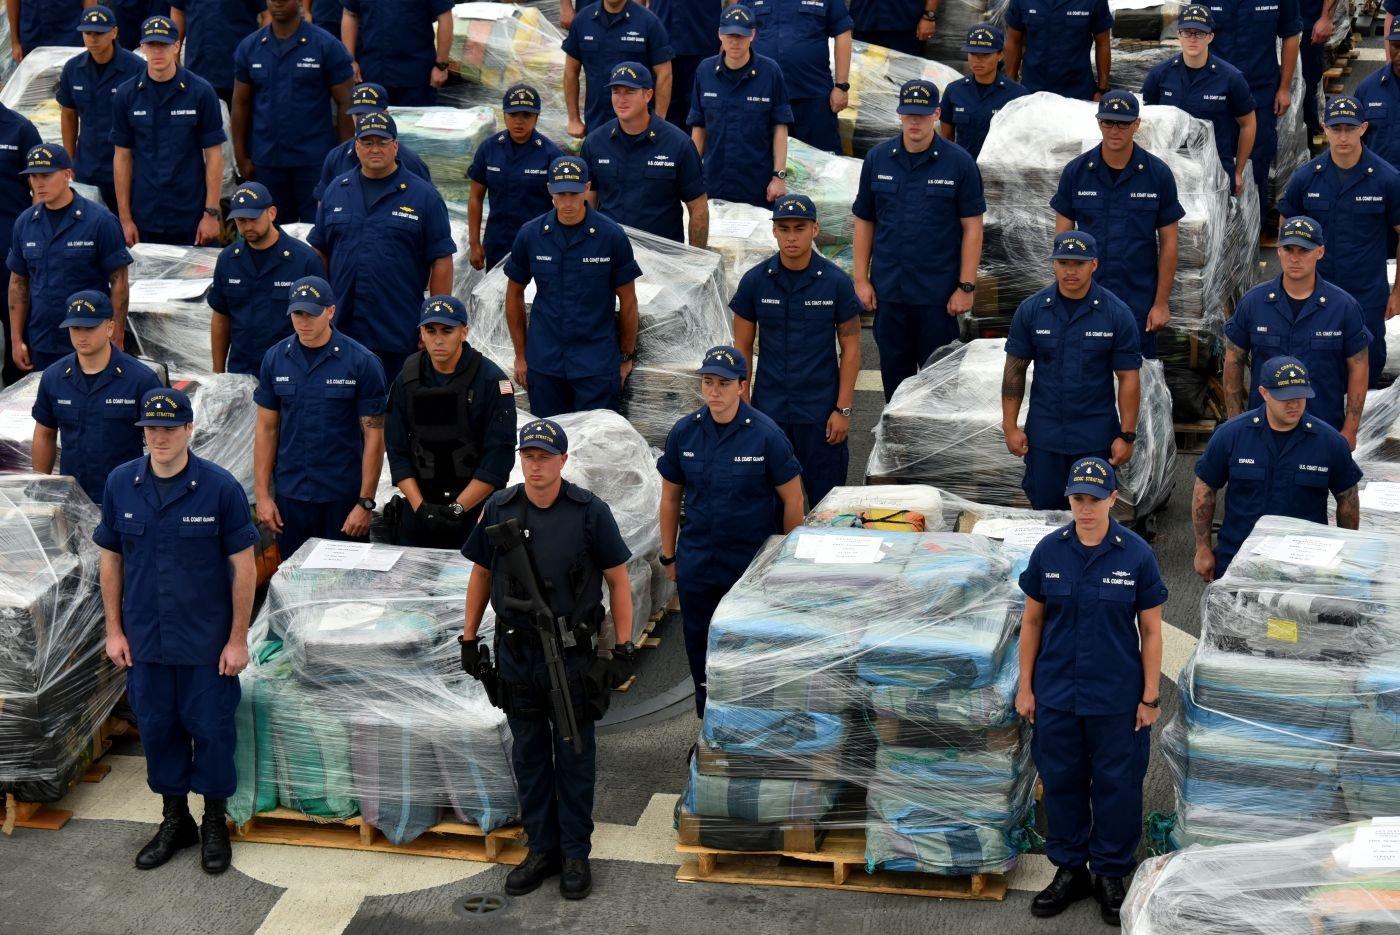 Operation MARTILLO: U.S. Coast Guard, Law Enforcement Teams Seize More than 32 Tons of Cocaine